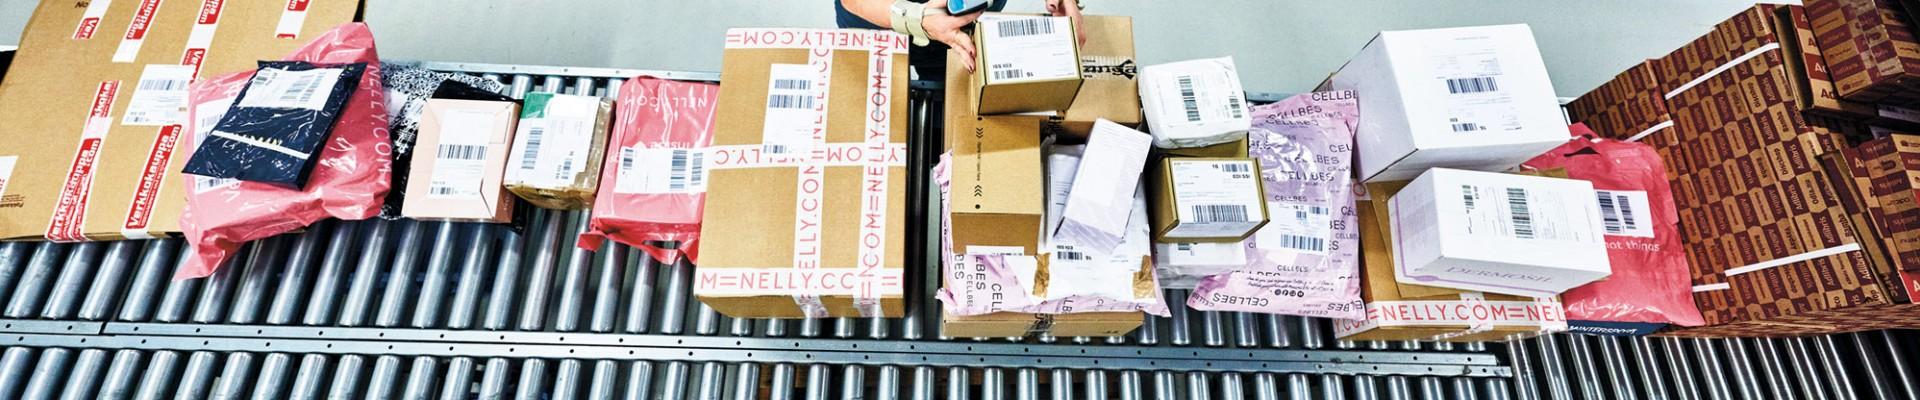 Paketsortering